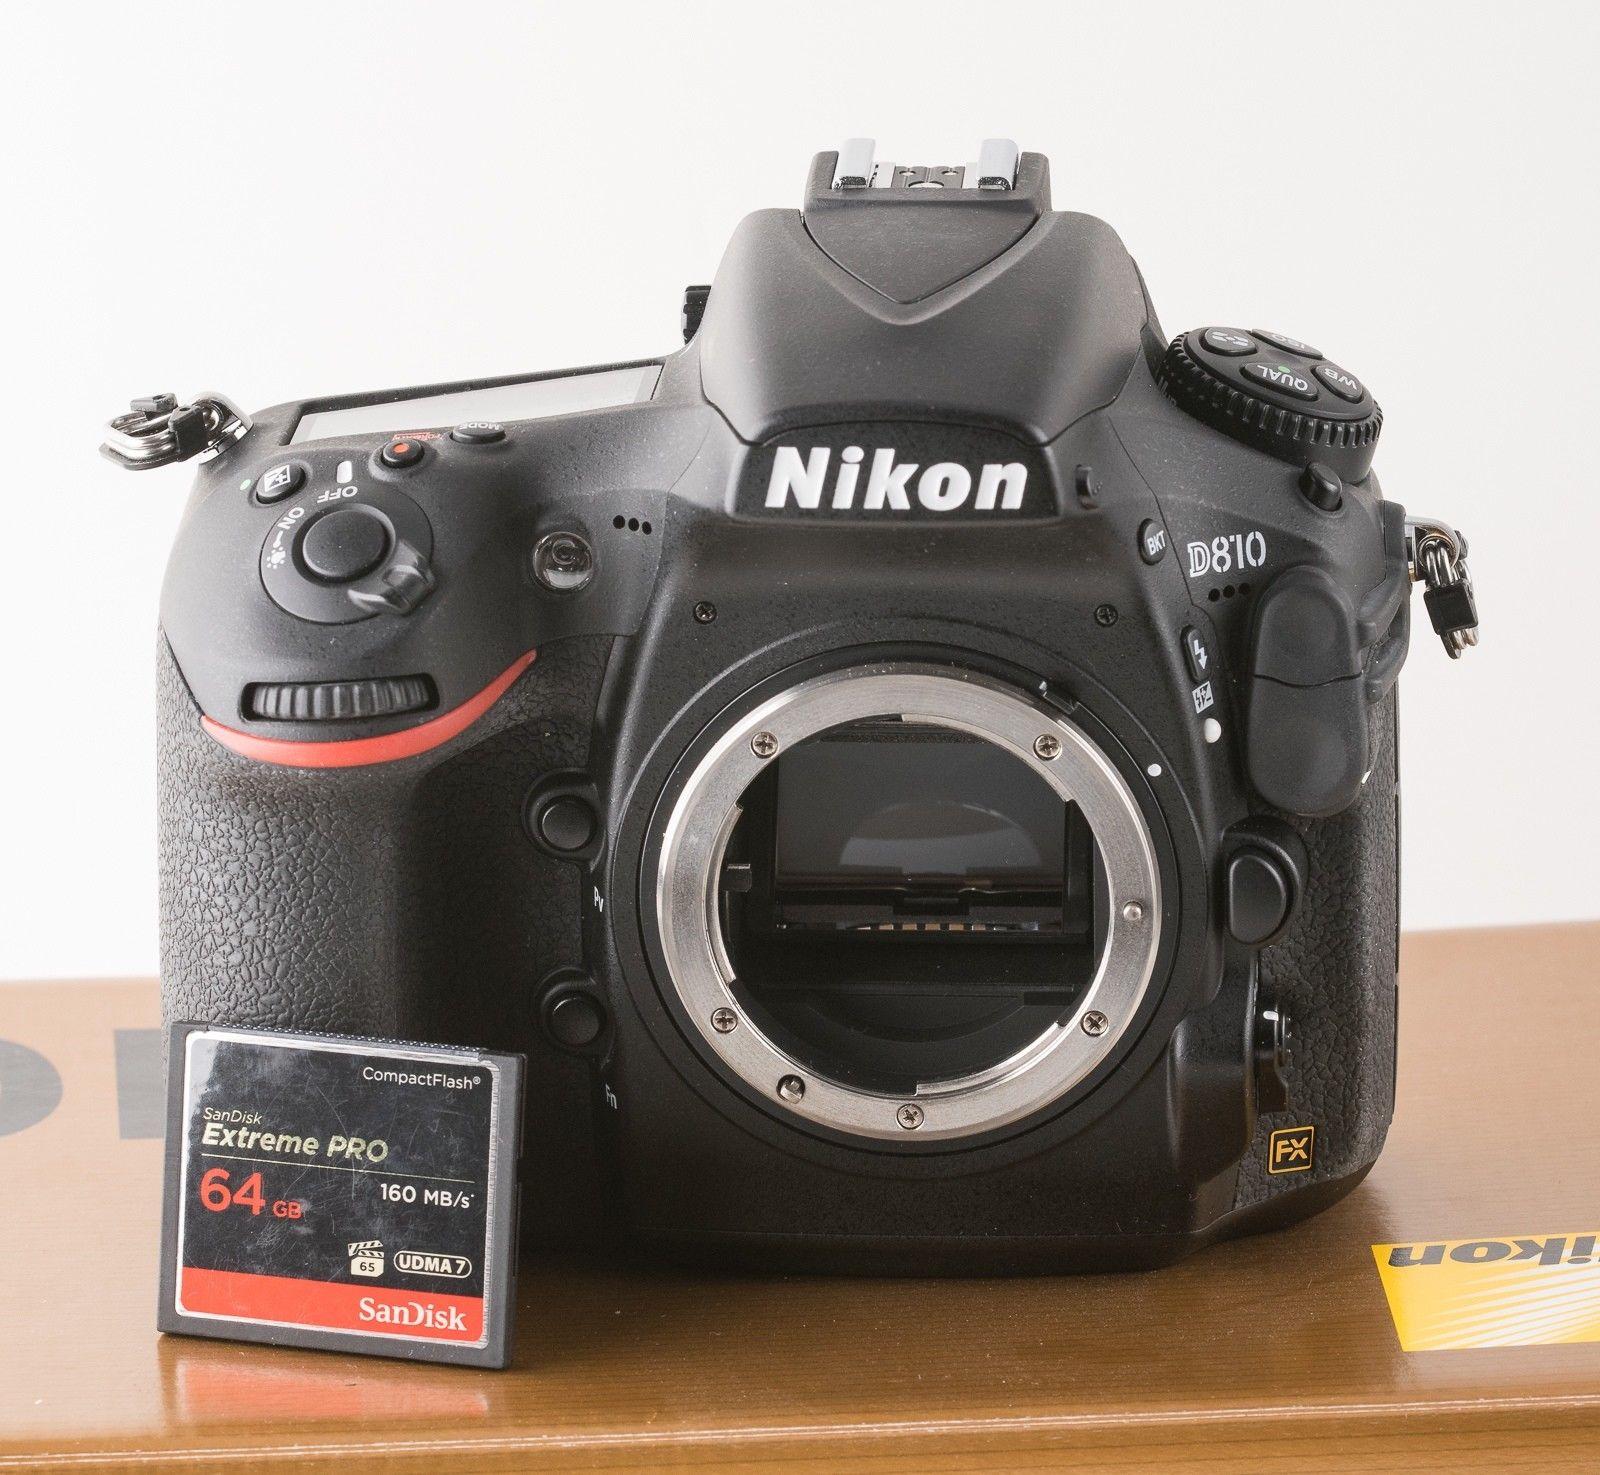 Nikon D810 D-SLR Body, 13 Monate jung, keine 4.500 Auslösungen, super Zustand